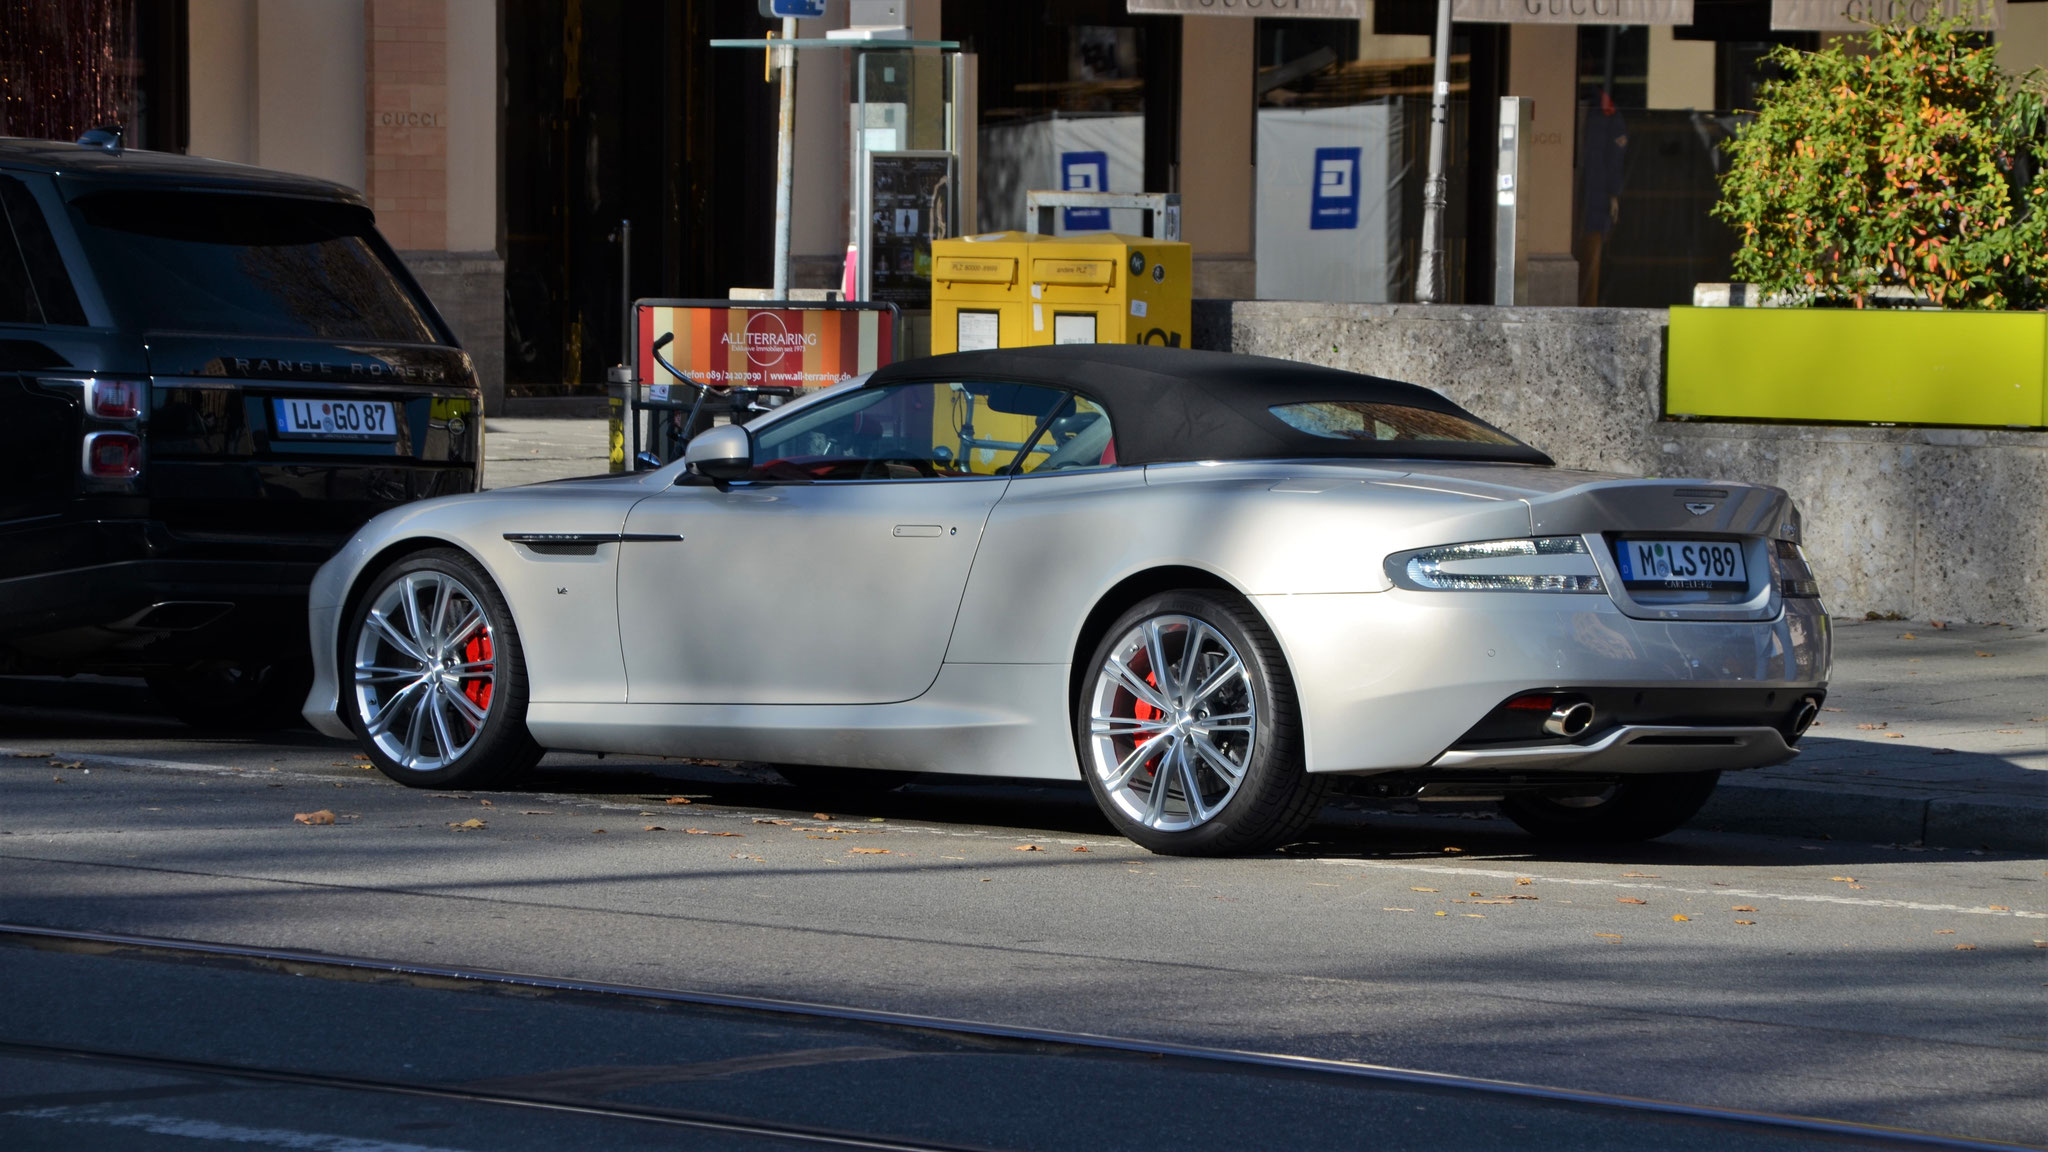 Aston Martin DB9 GT Volante - M-LS-989